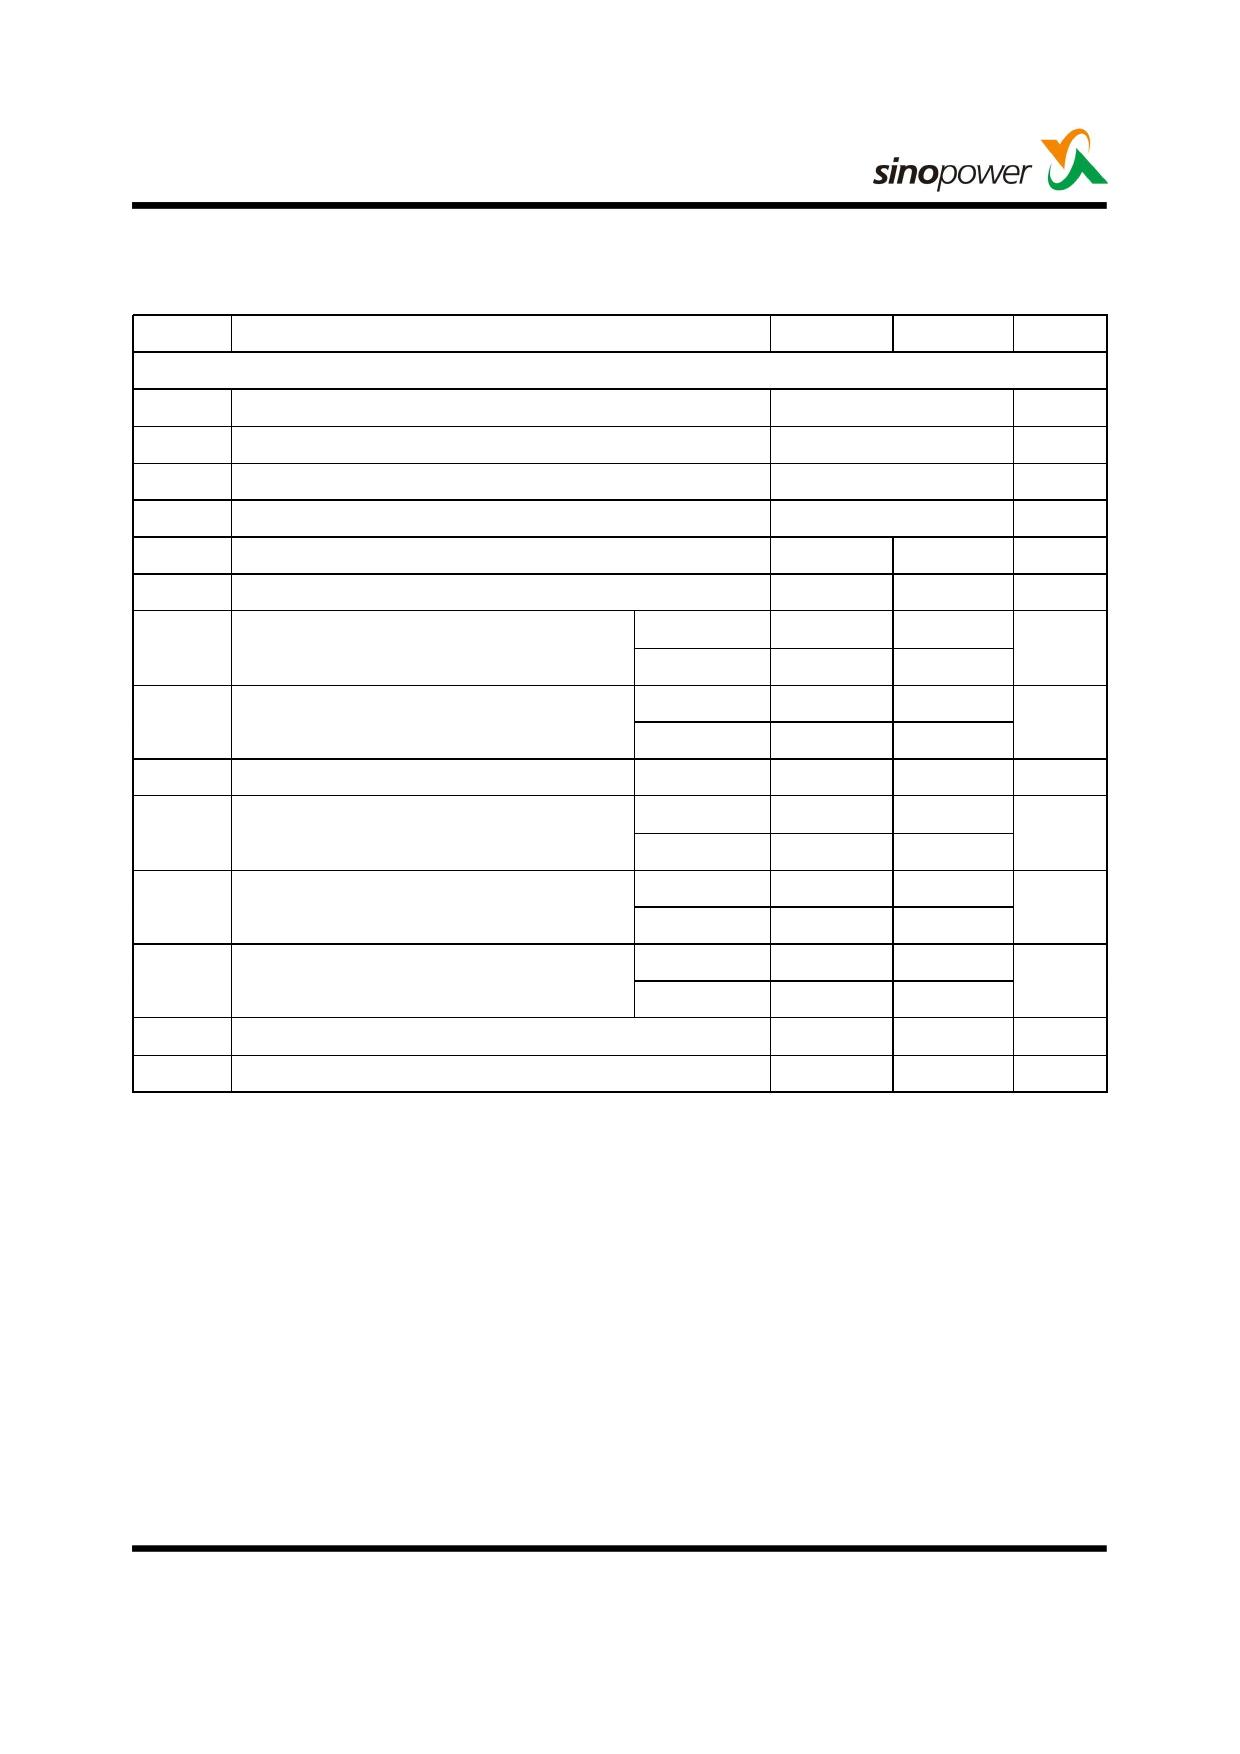 SM7320ESQG pdf, schematic